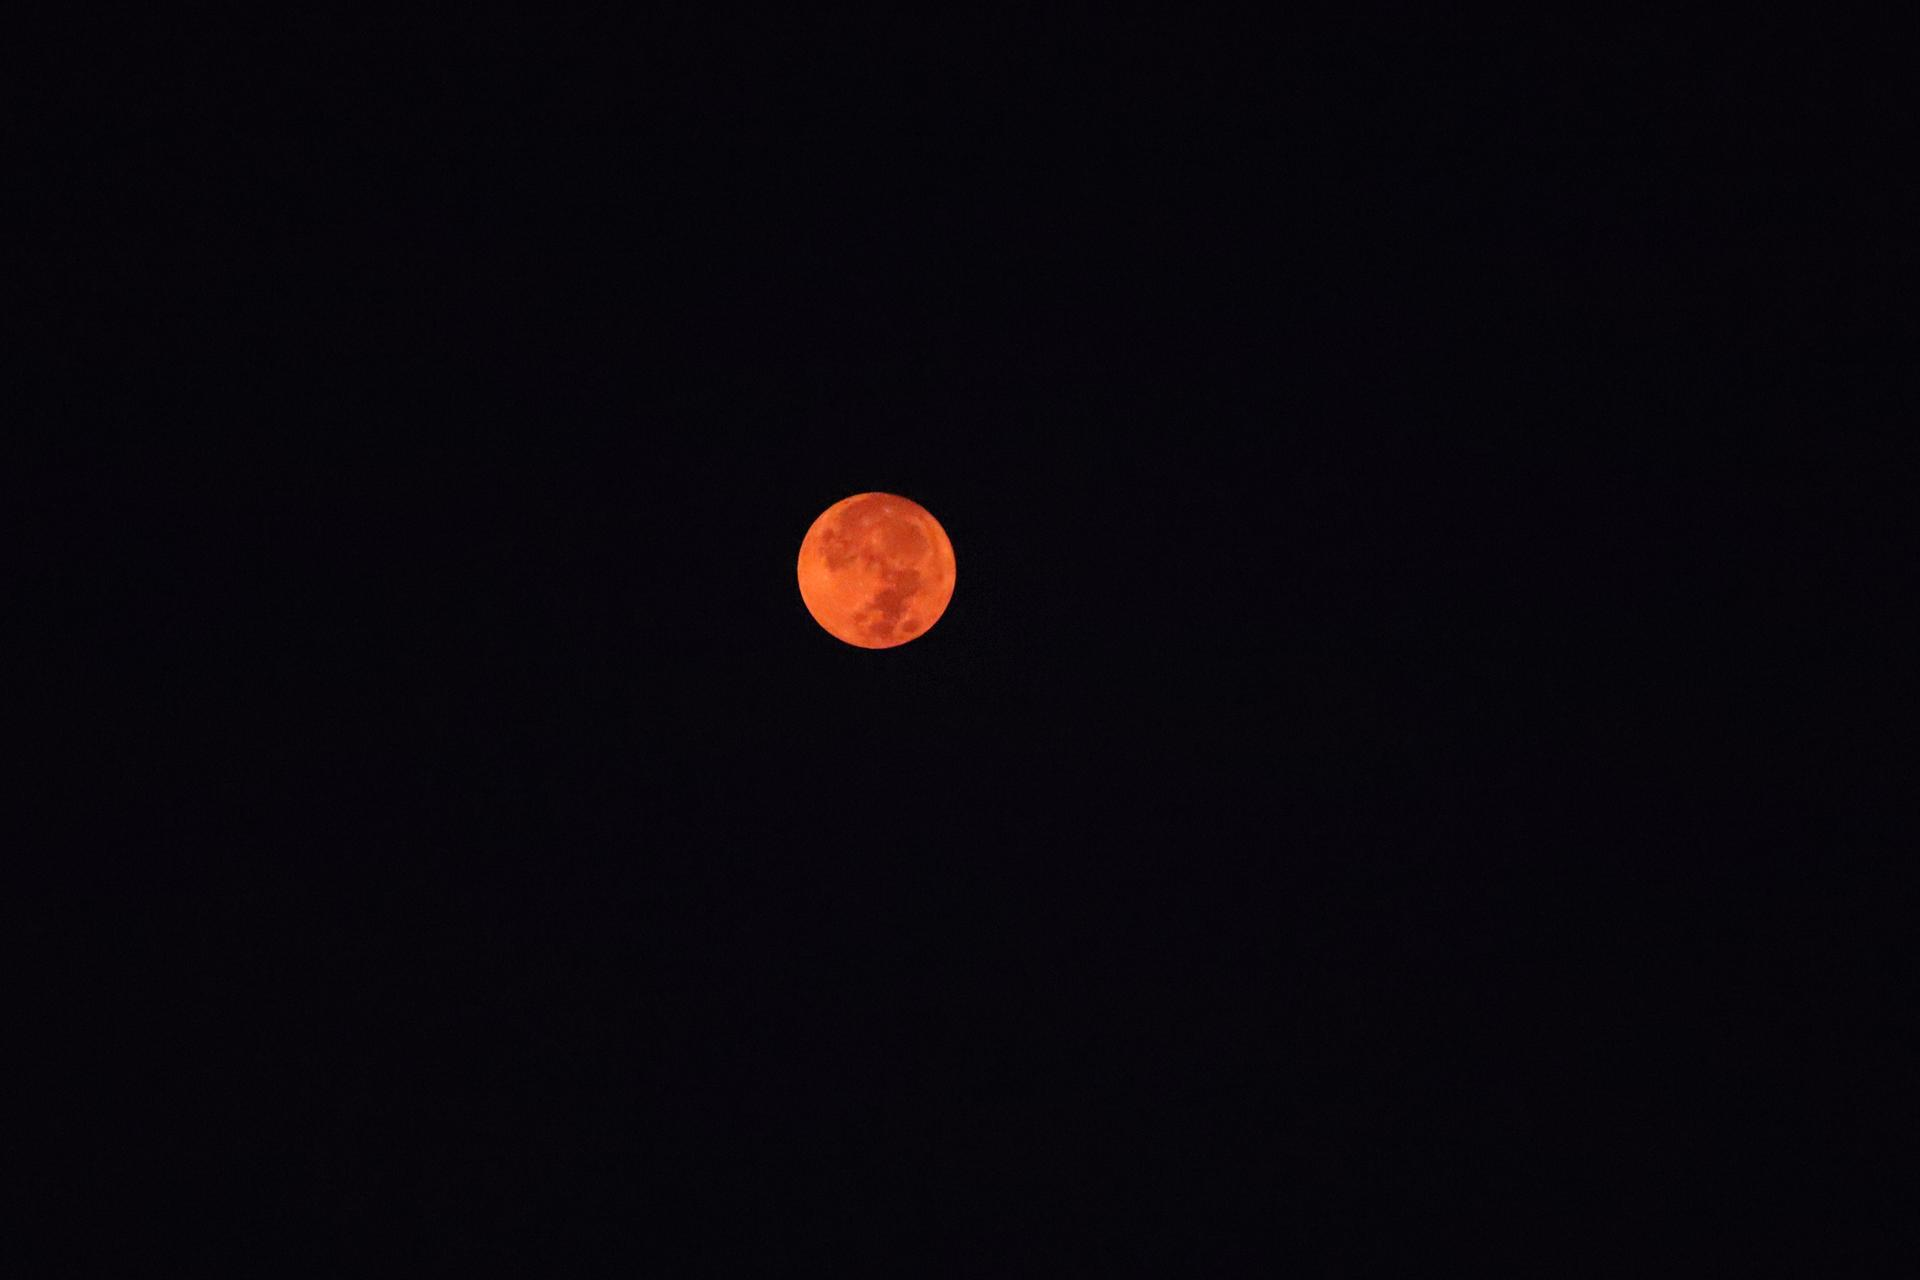 moon through the smoke